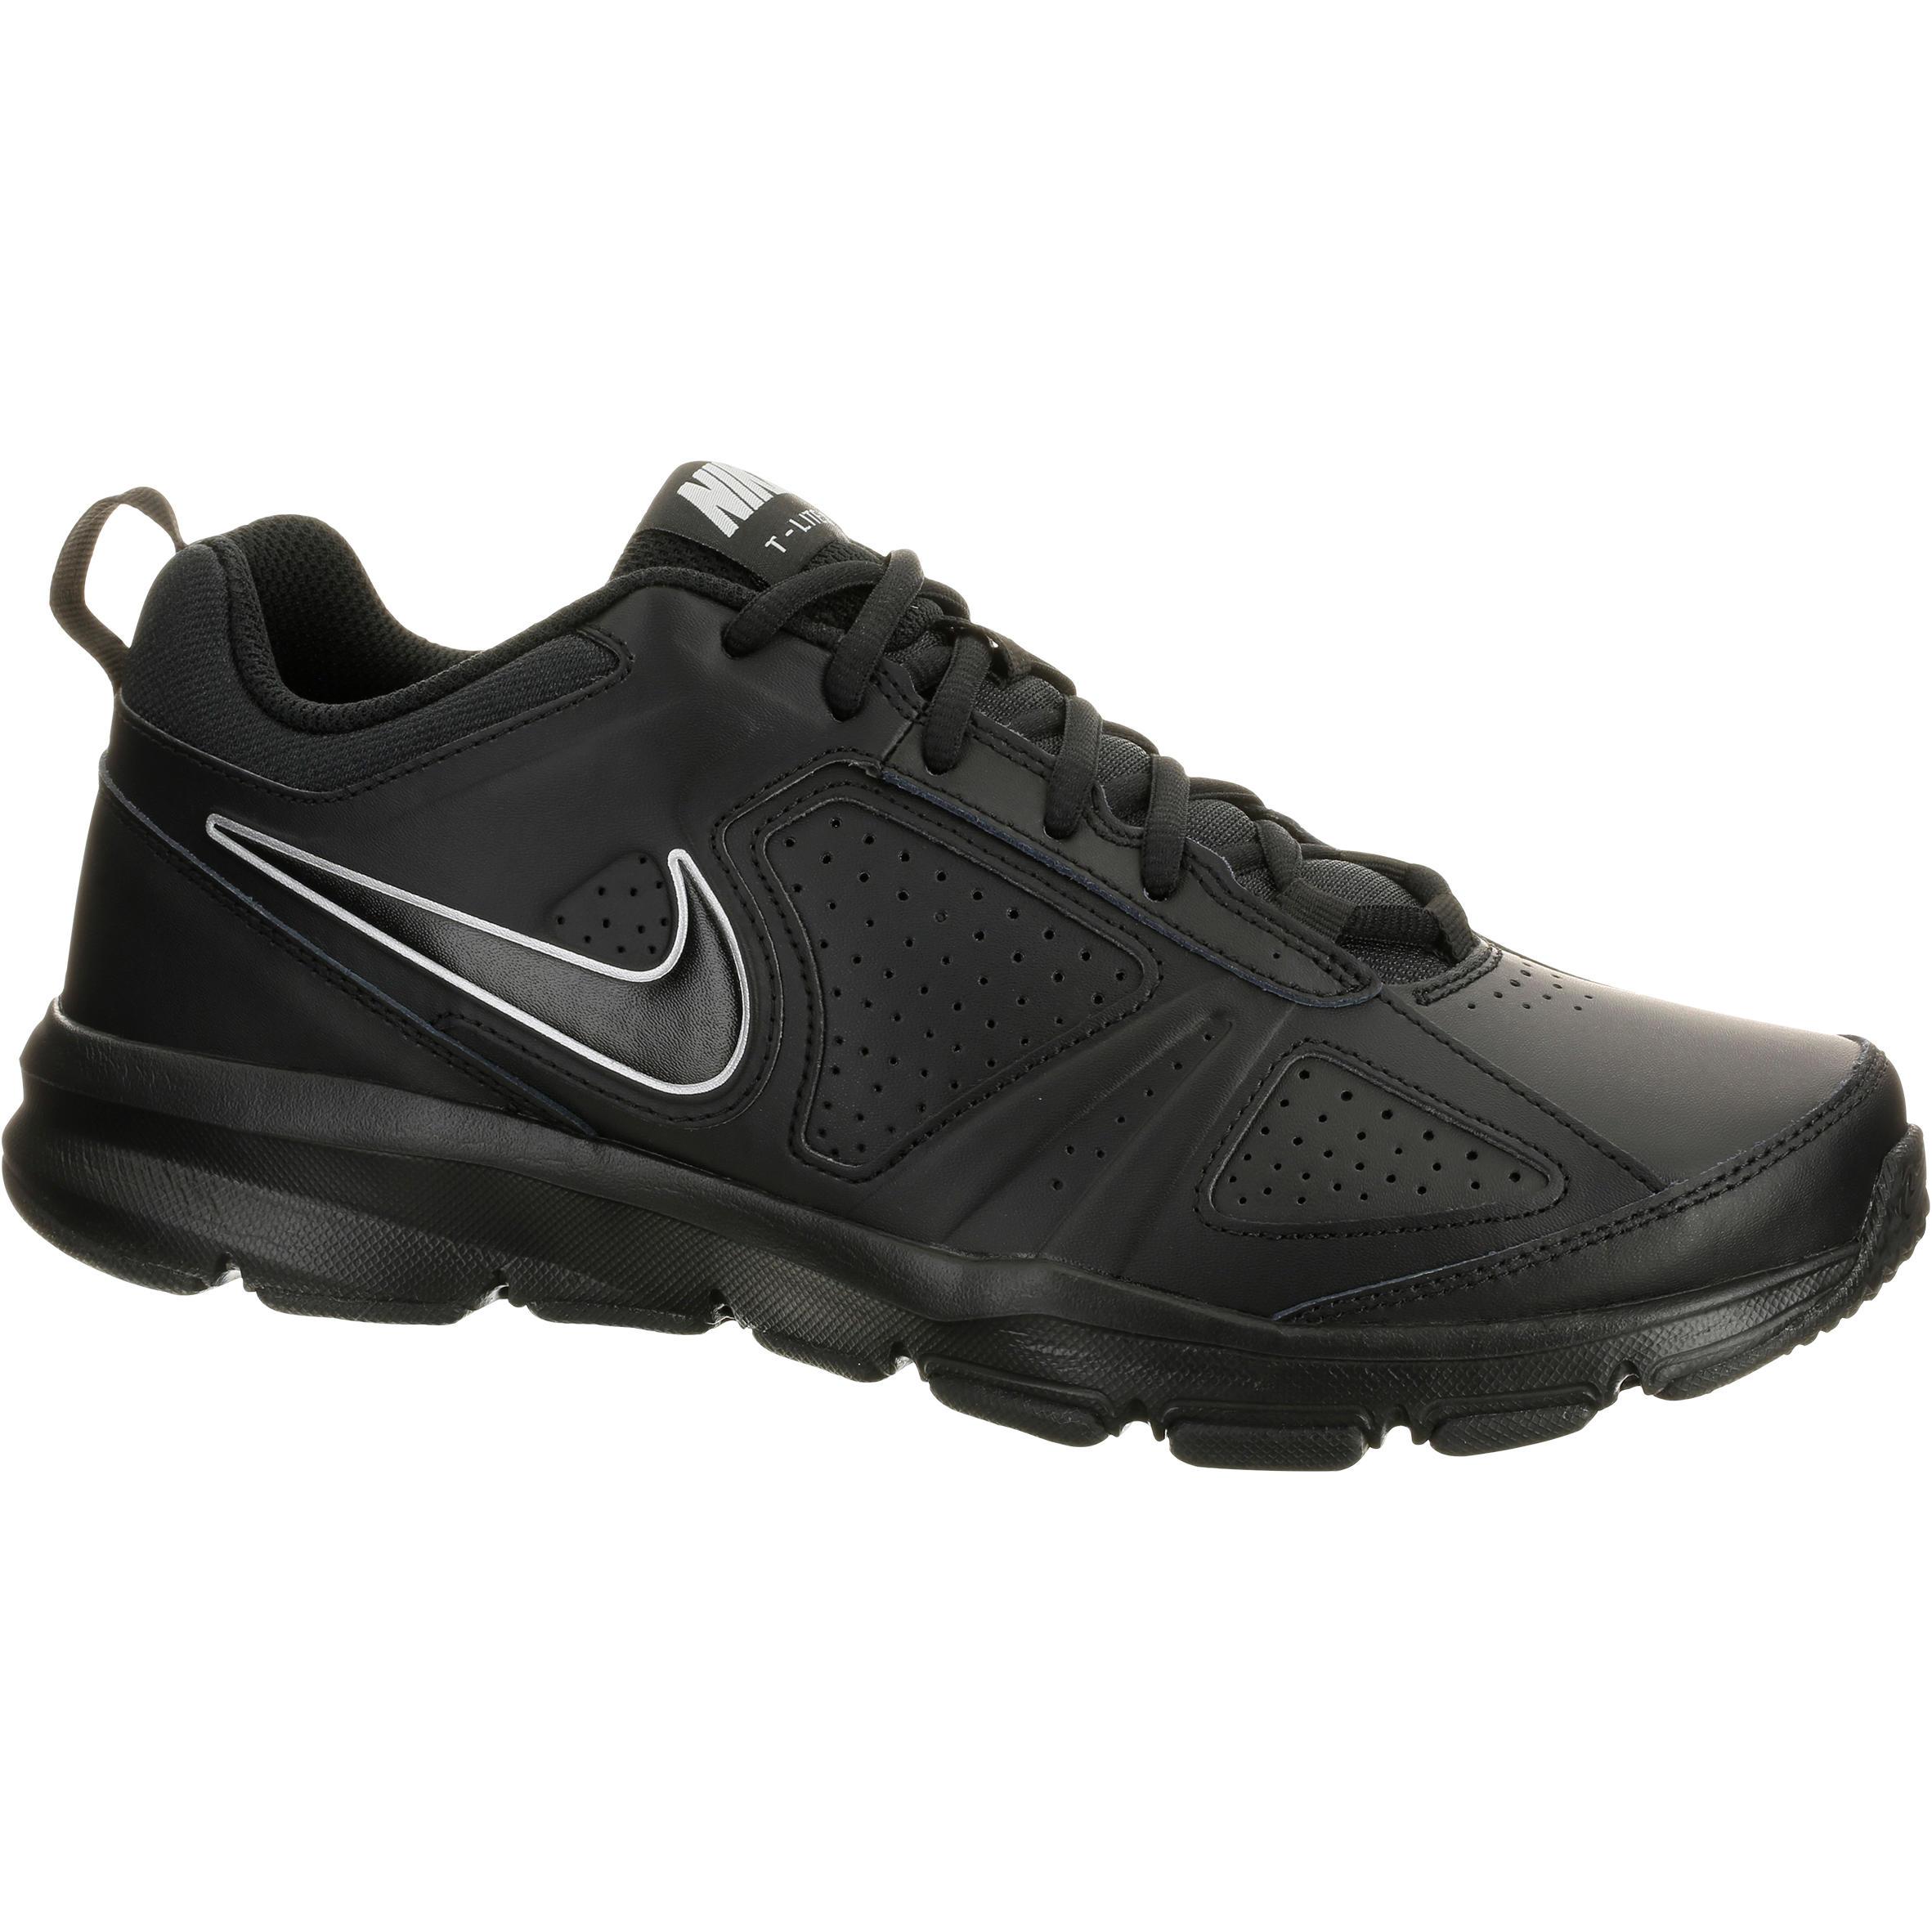 Chaussures marche sportive homme Nike T Lite noir NIKE